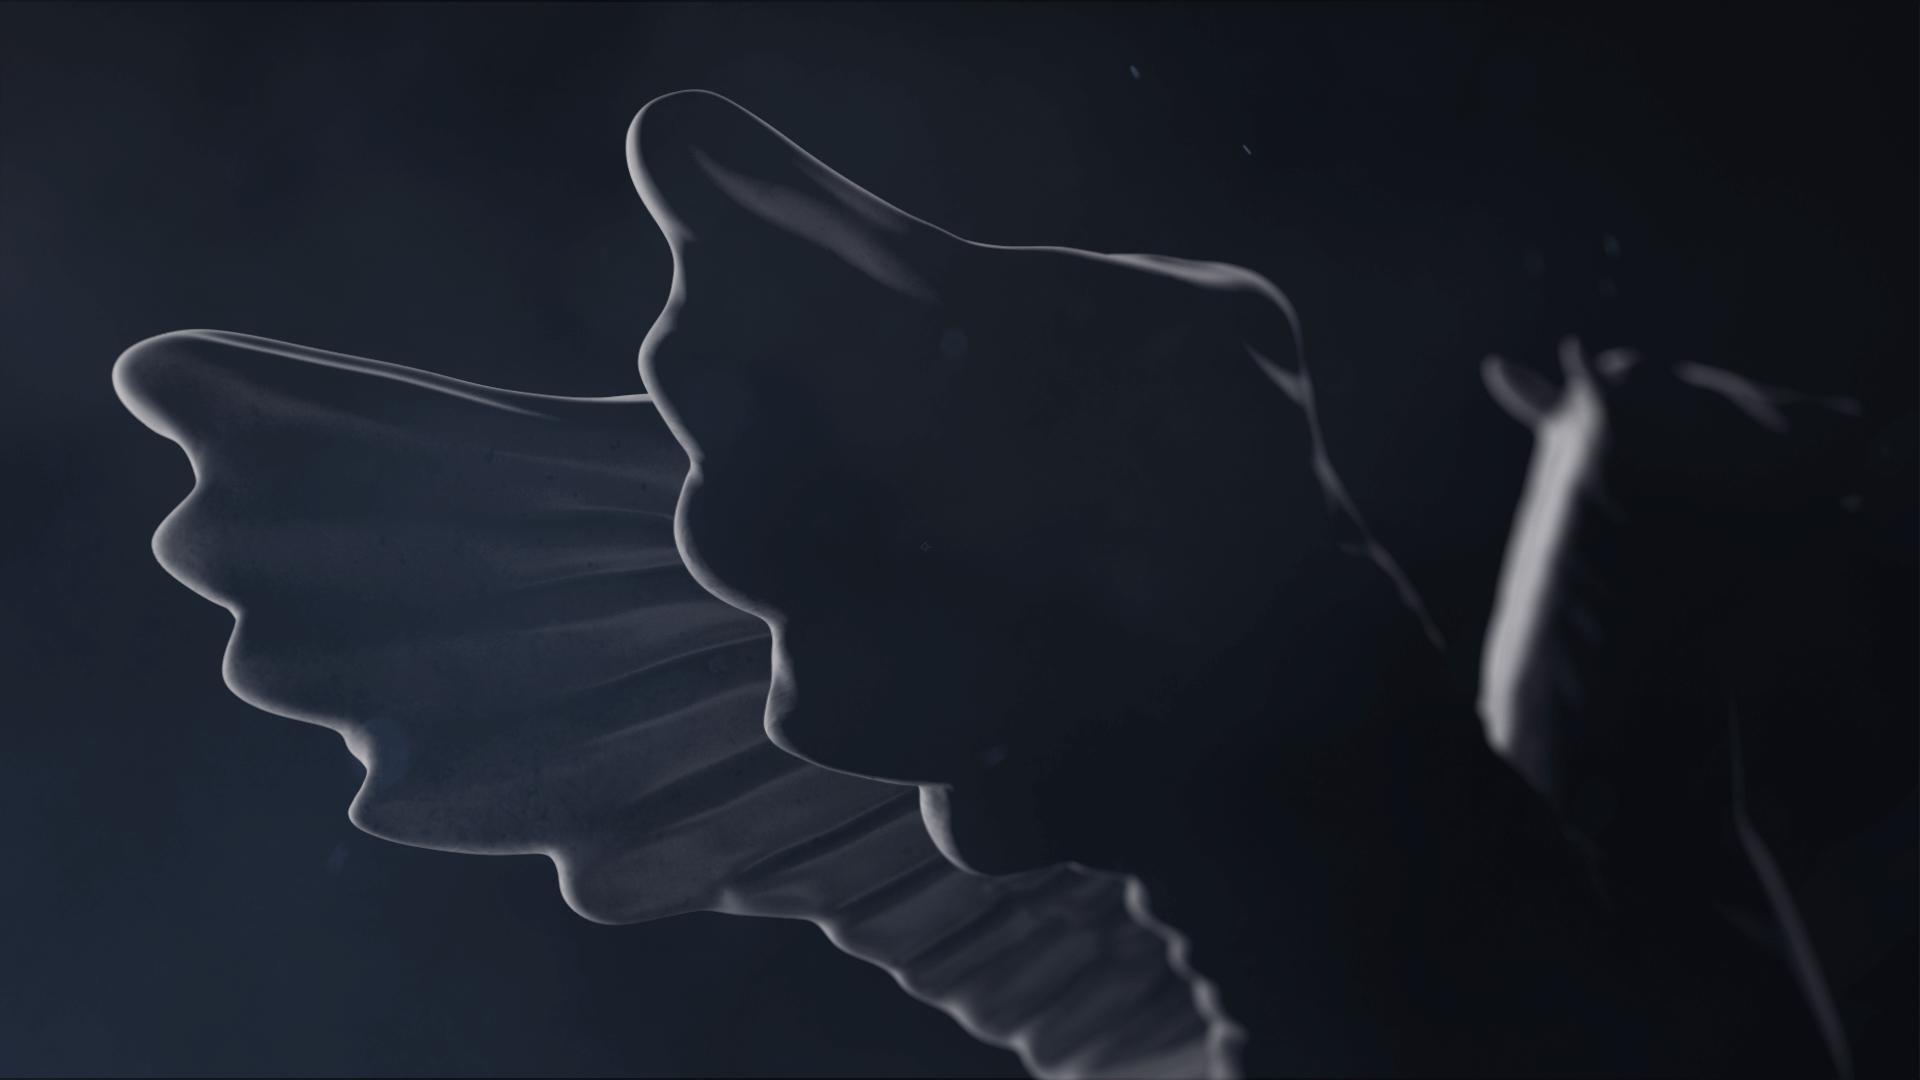 02_Pegasus_07_